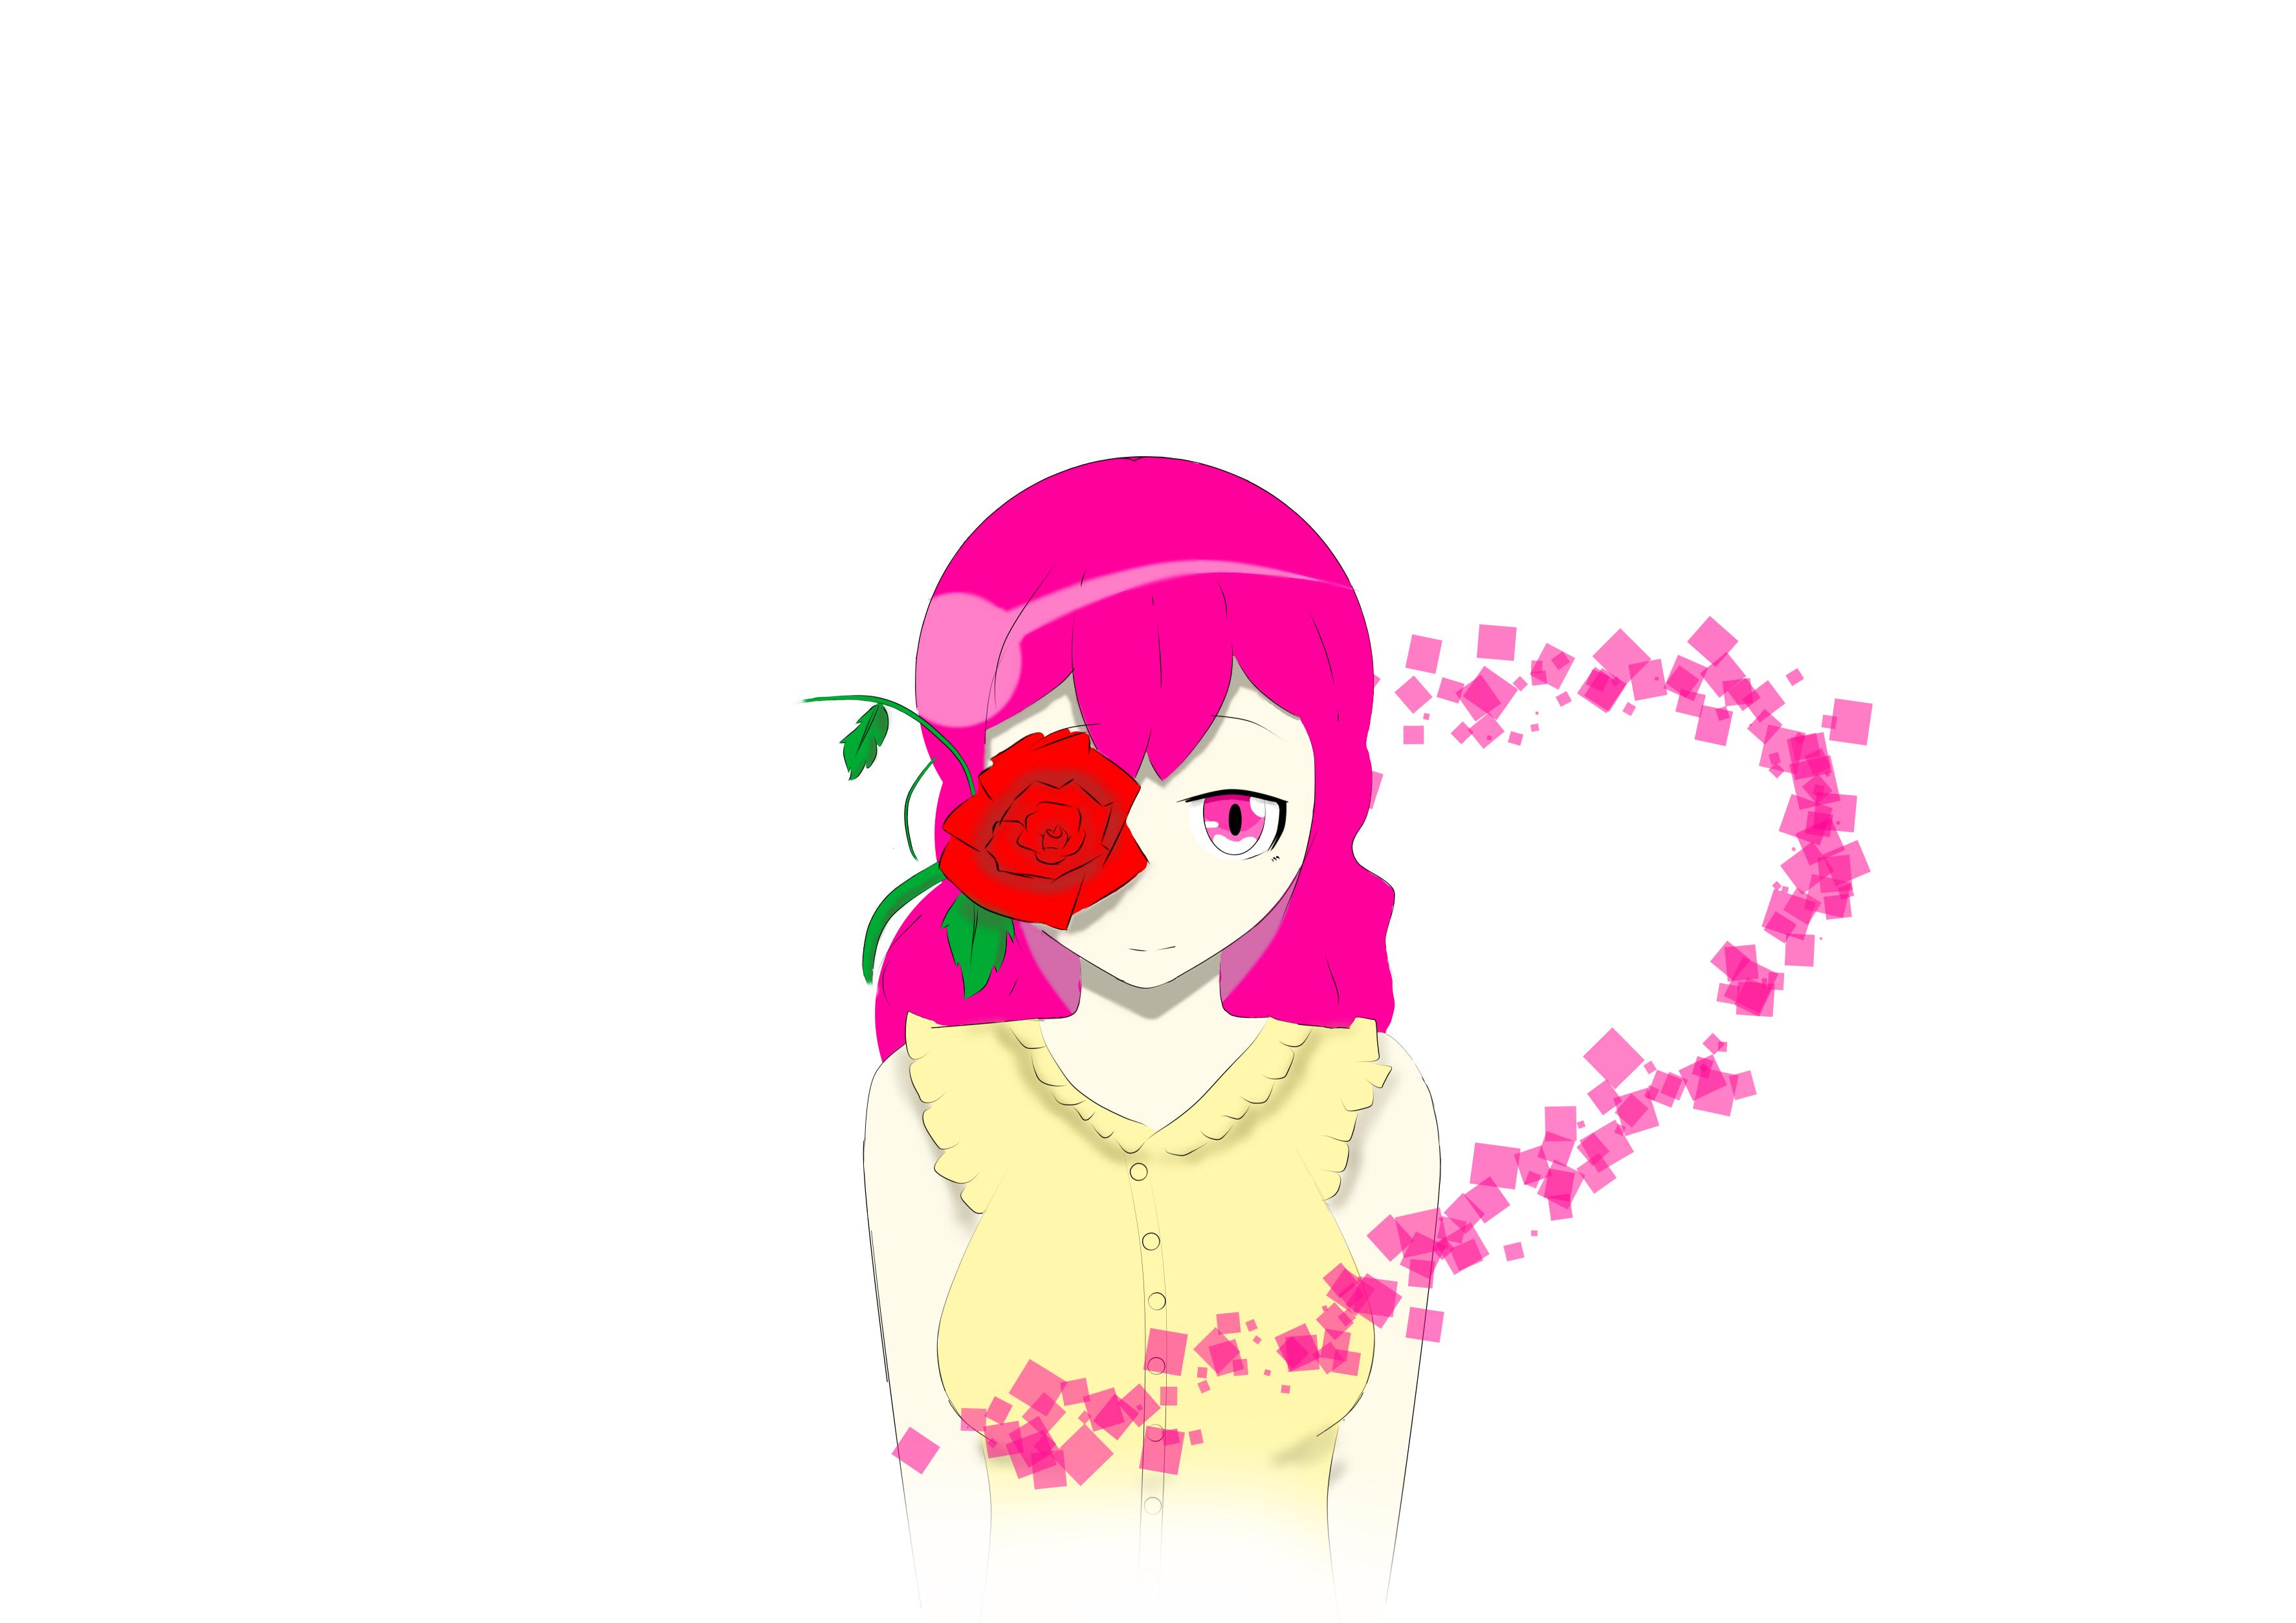 She likes Roses